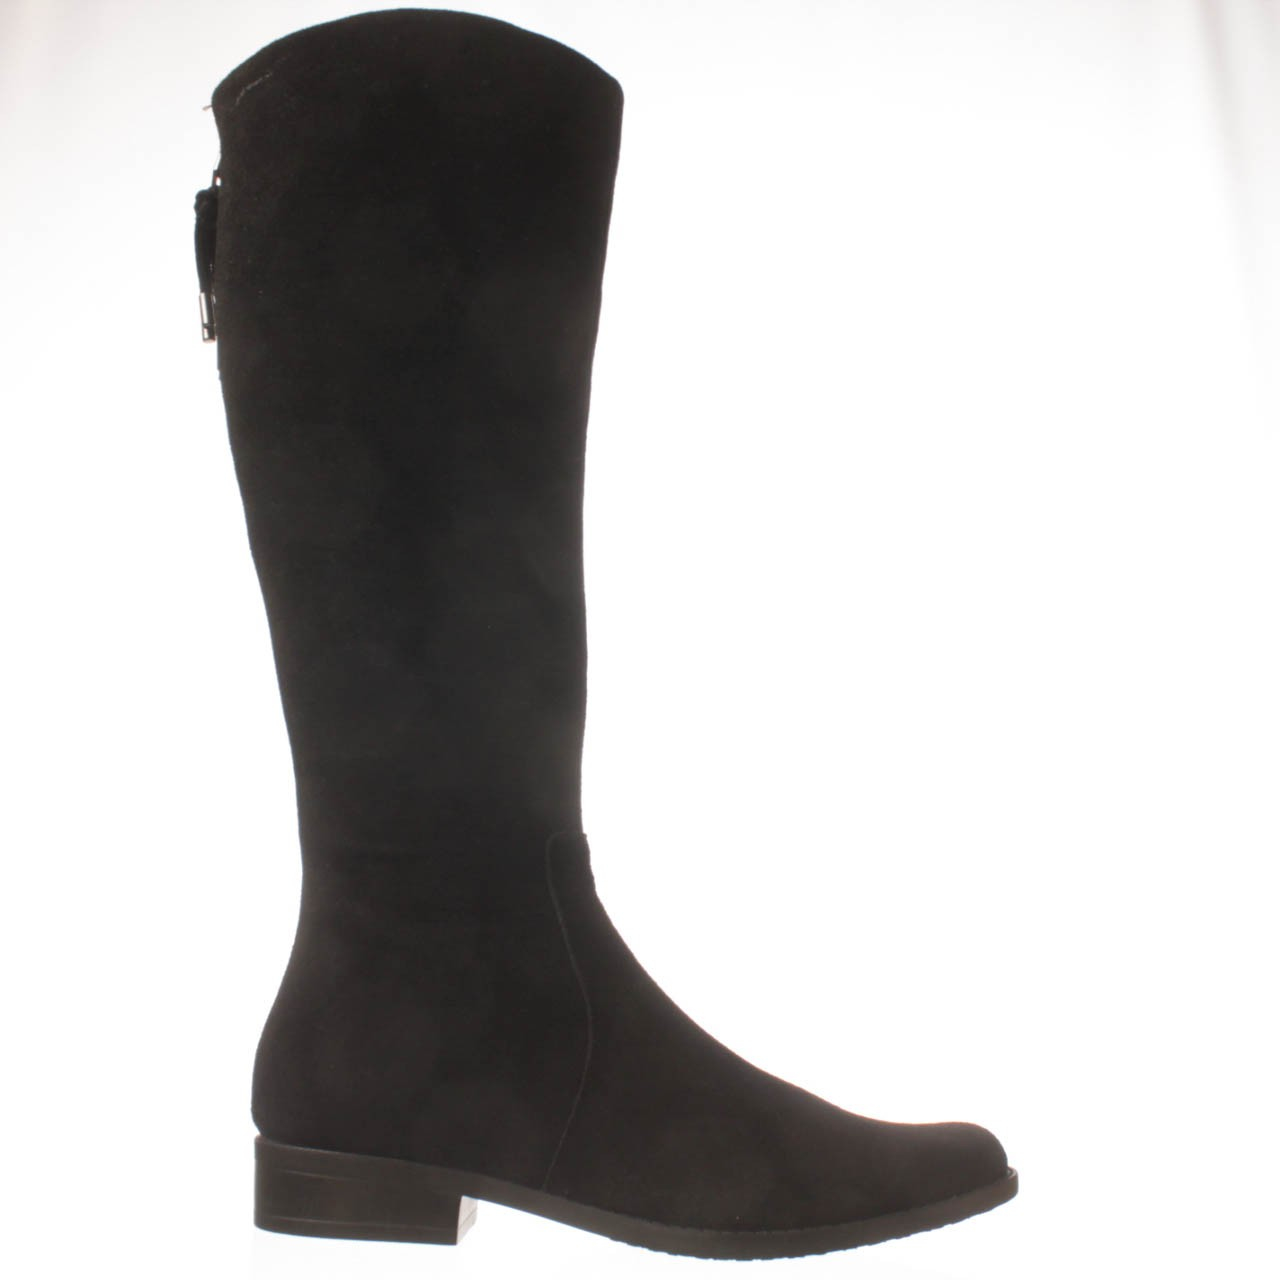 calvin klein taylie wide calf knee high boot in black lyst